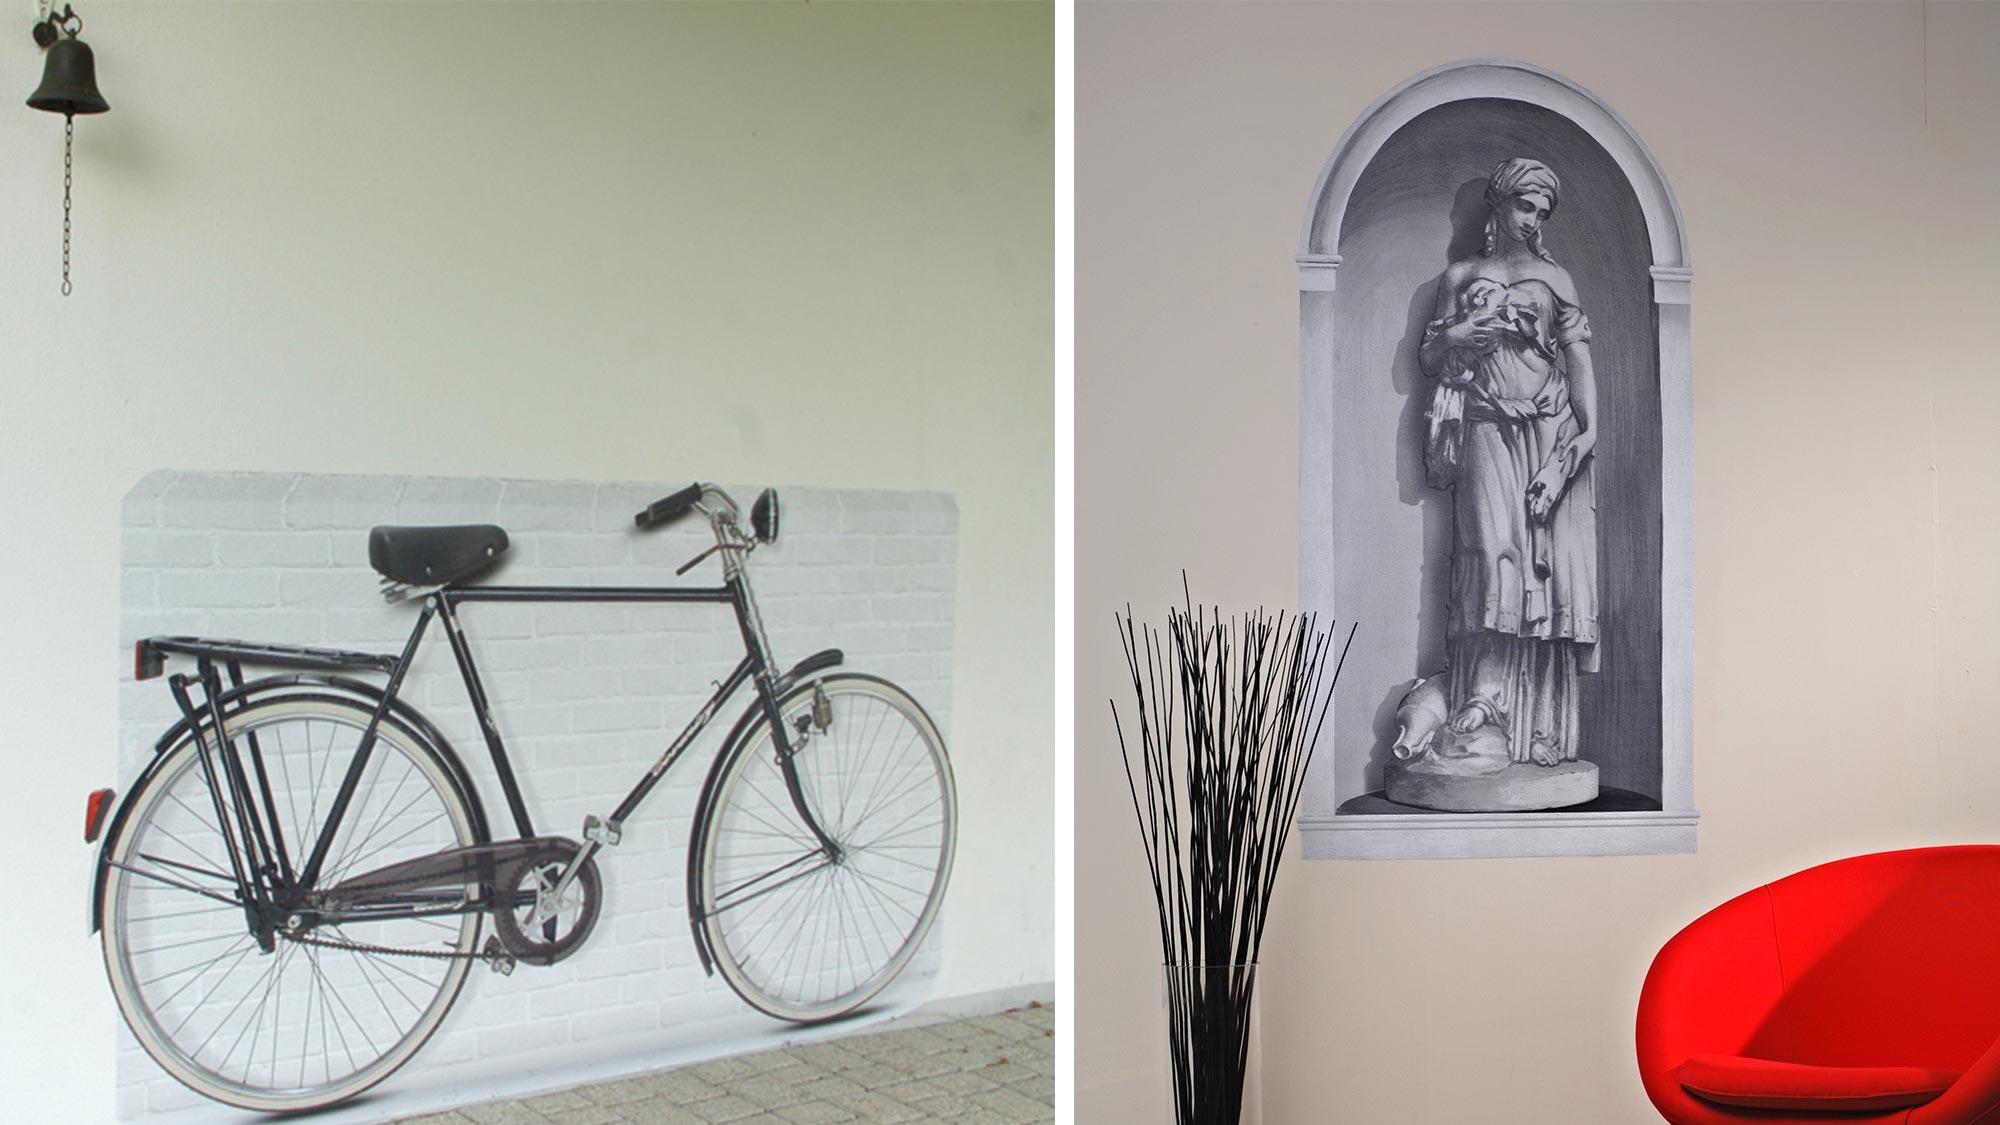 Trompe l'oeil adesivi murali | Caratteristiche e applicazione